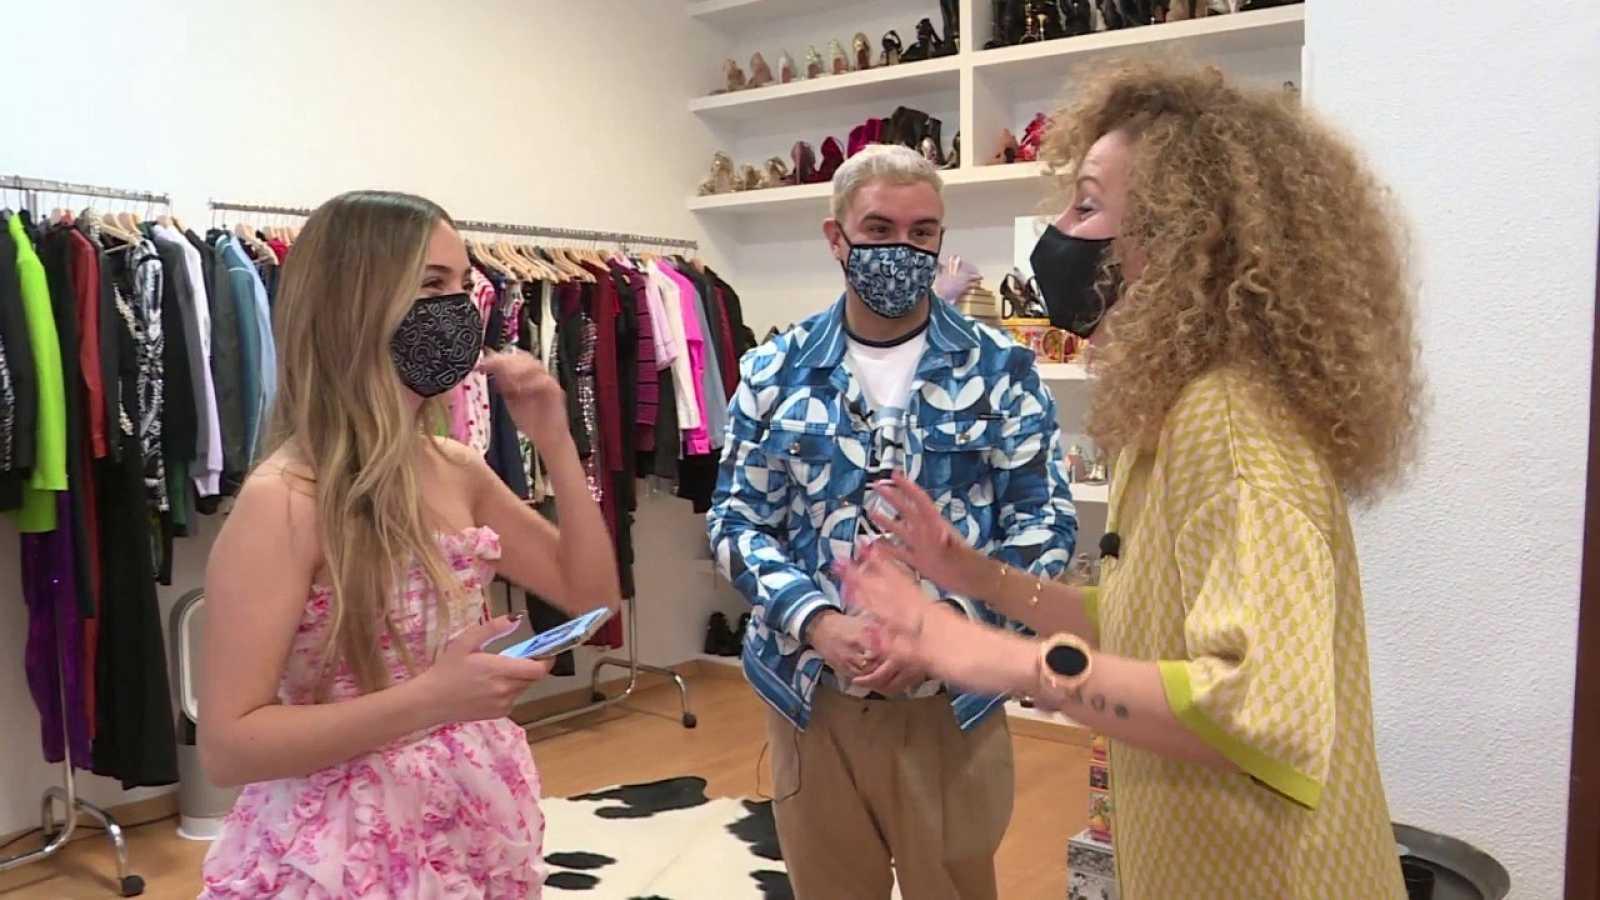 Realidad del sector textil tras la pandemia